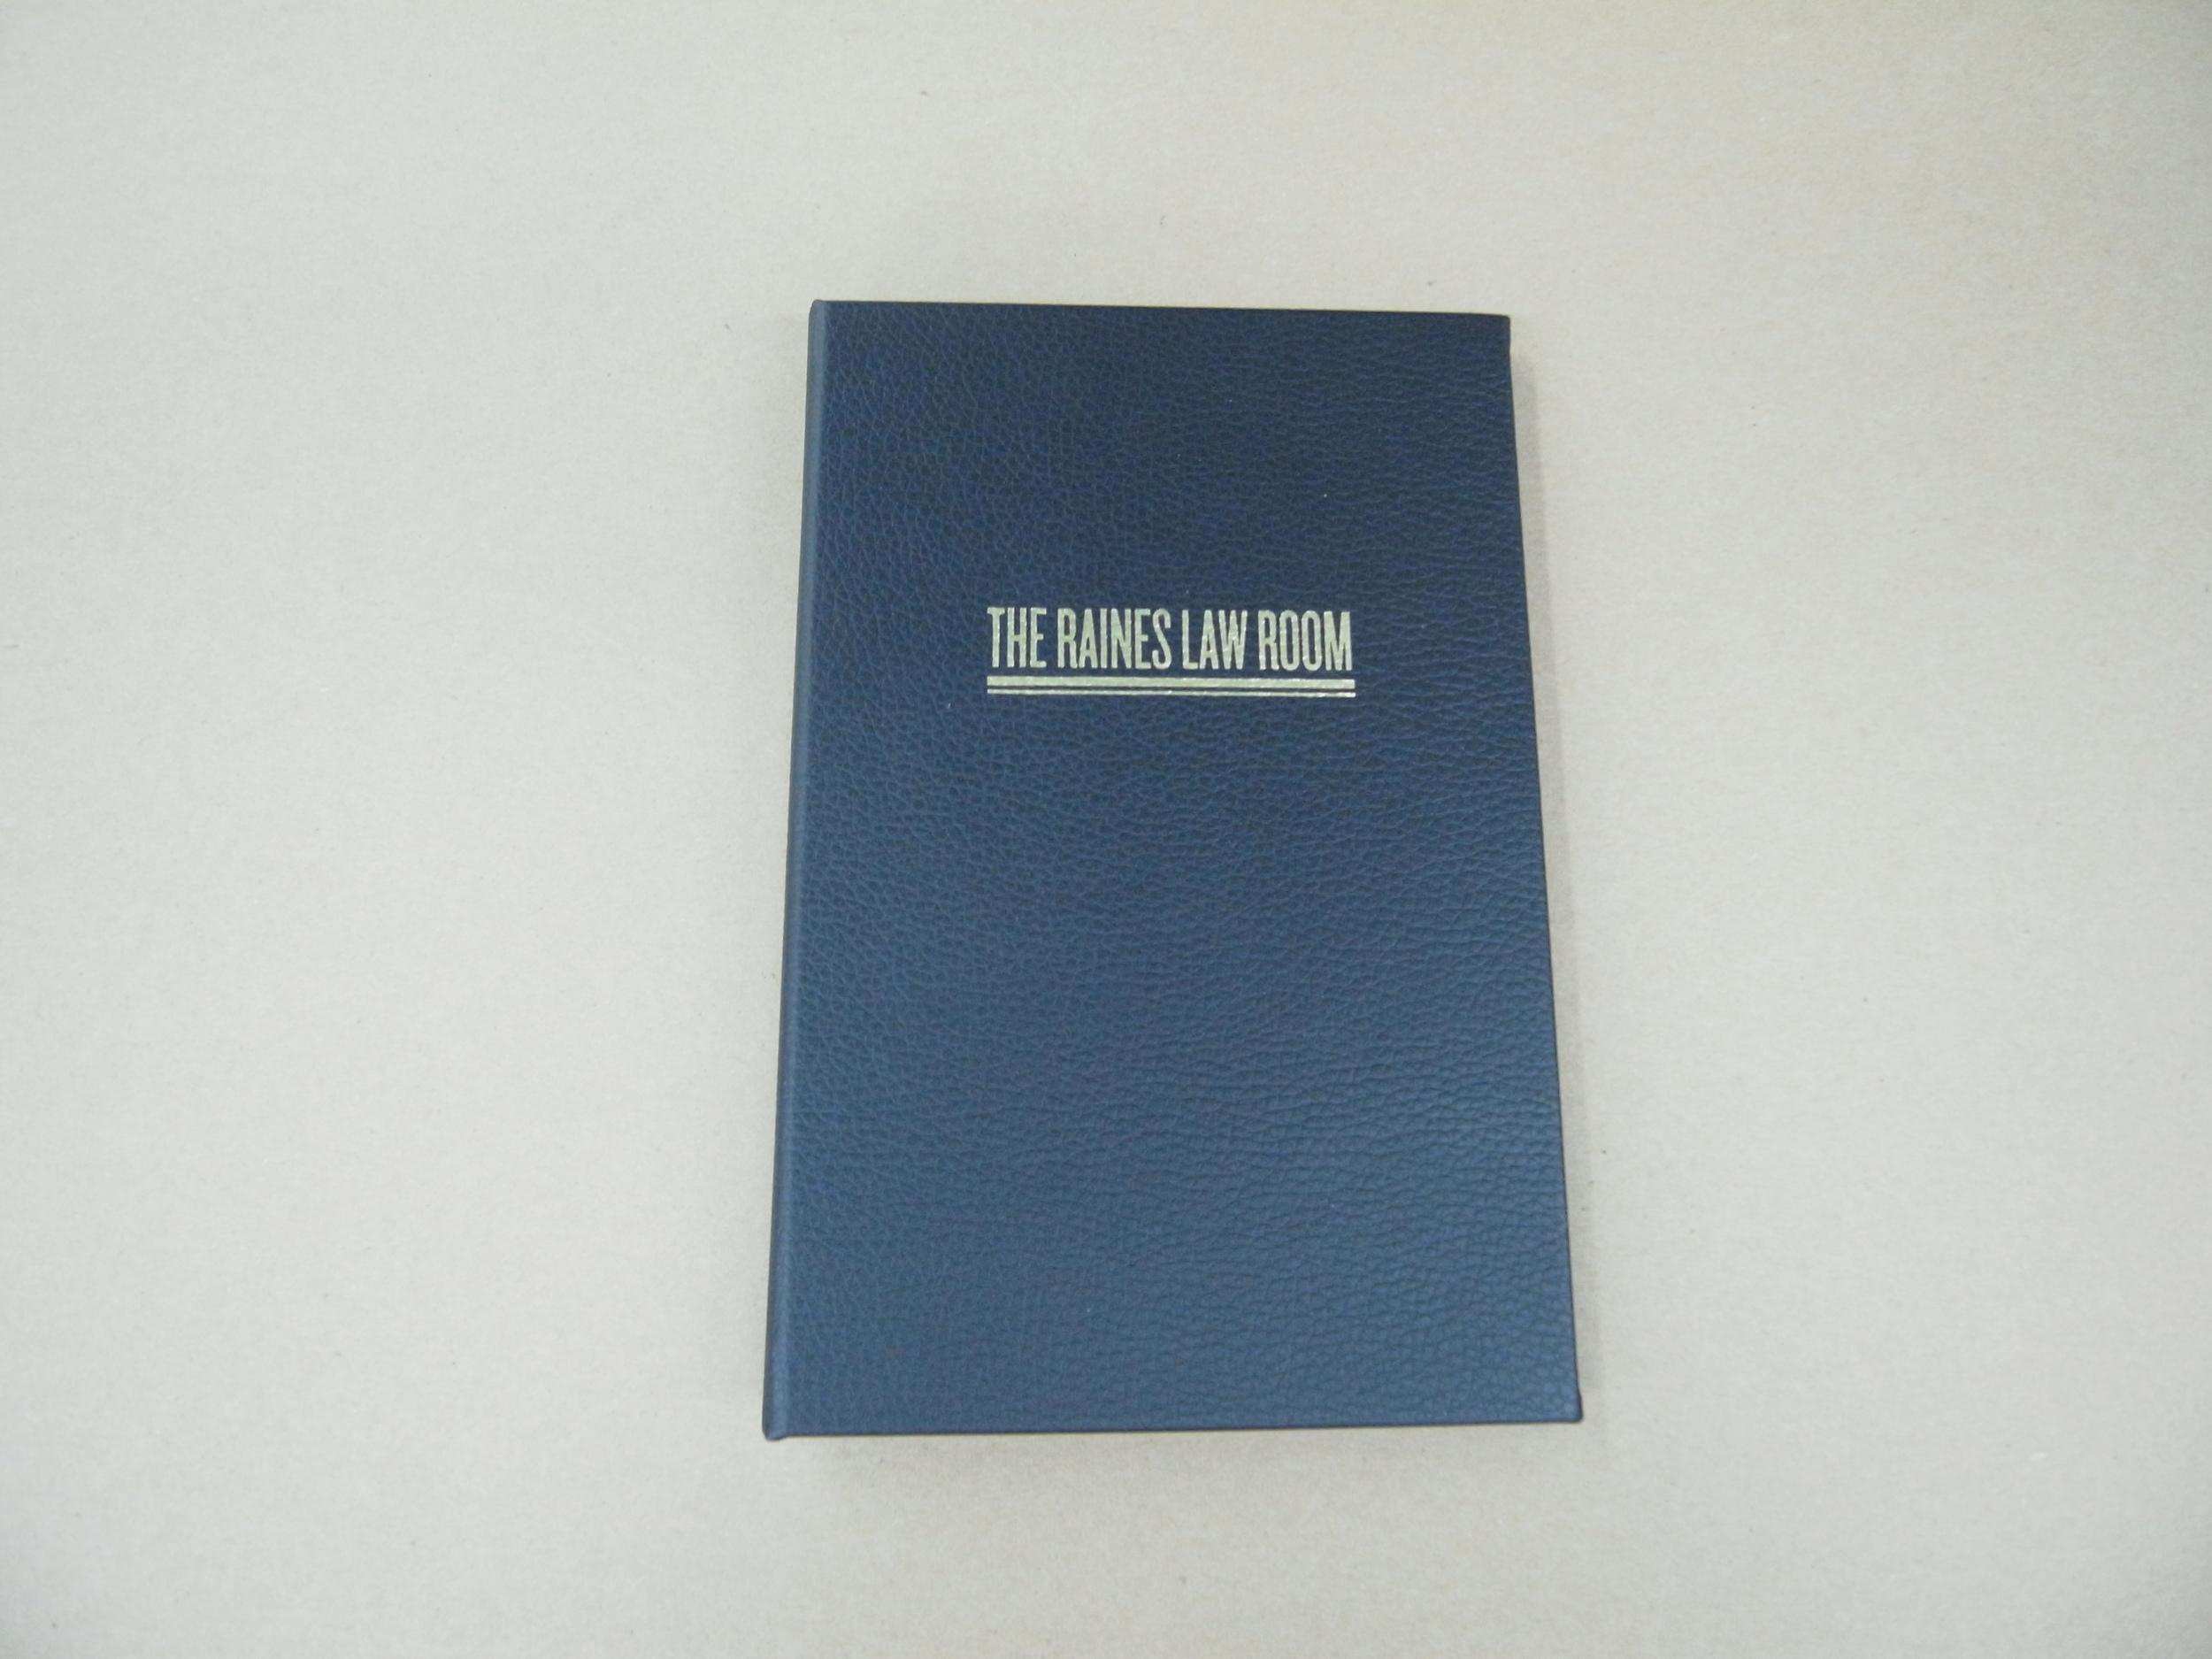 Blue Menu Cover With Brand Name